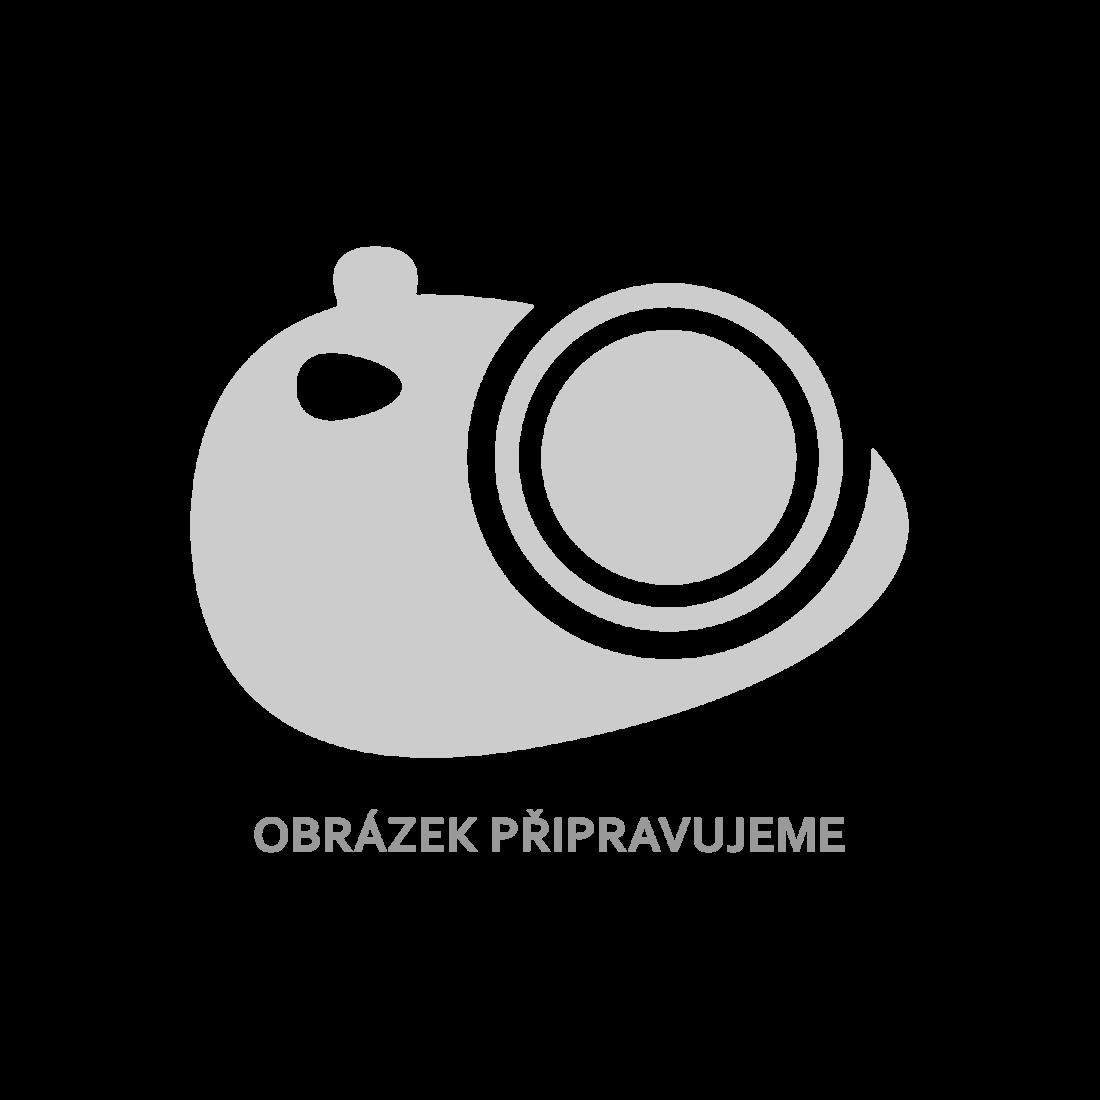 WPC dlaždice 30x30cm 11 ks 1 m2, hnědé